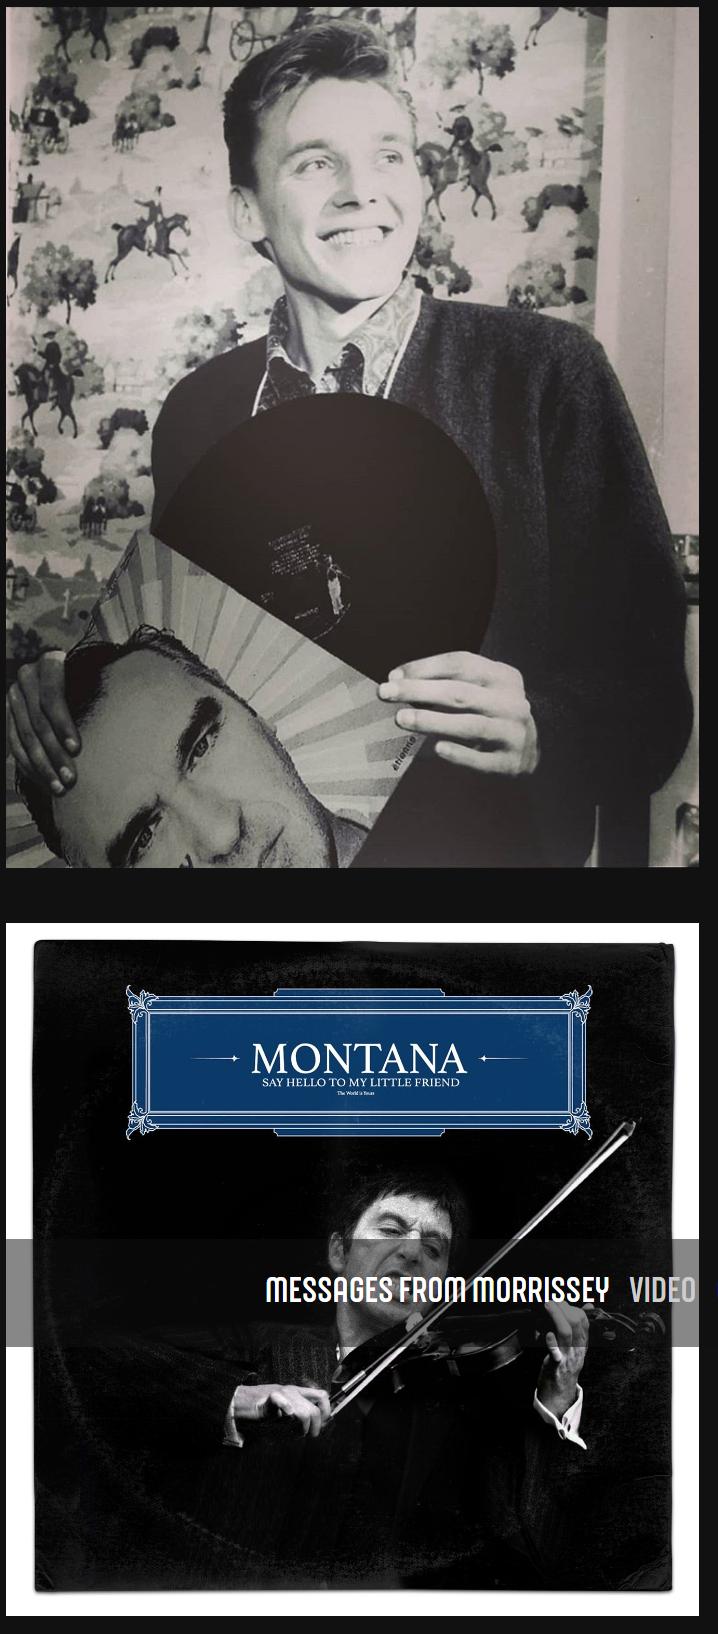 Opera Momentaufnahme_2019-10-05_141421_www.morrisseycentral.com.png